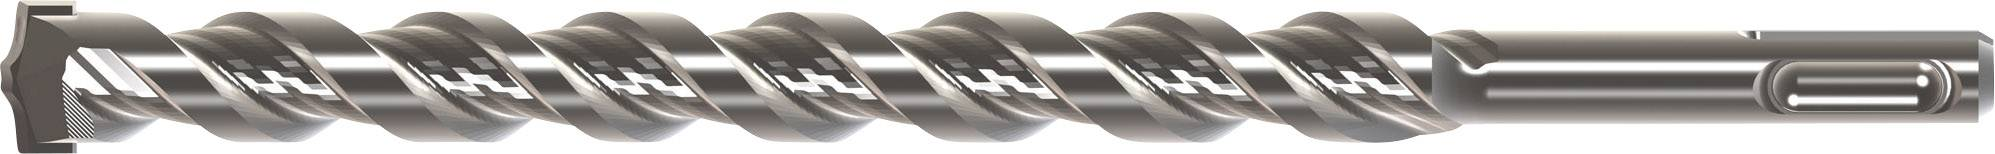 Tvrdý kov kladivový vrták Heller 156226, 6 mm, 110 mm, 1 ks